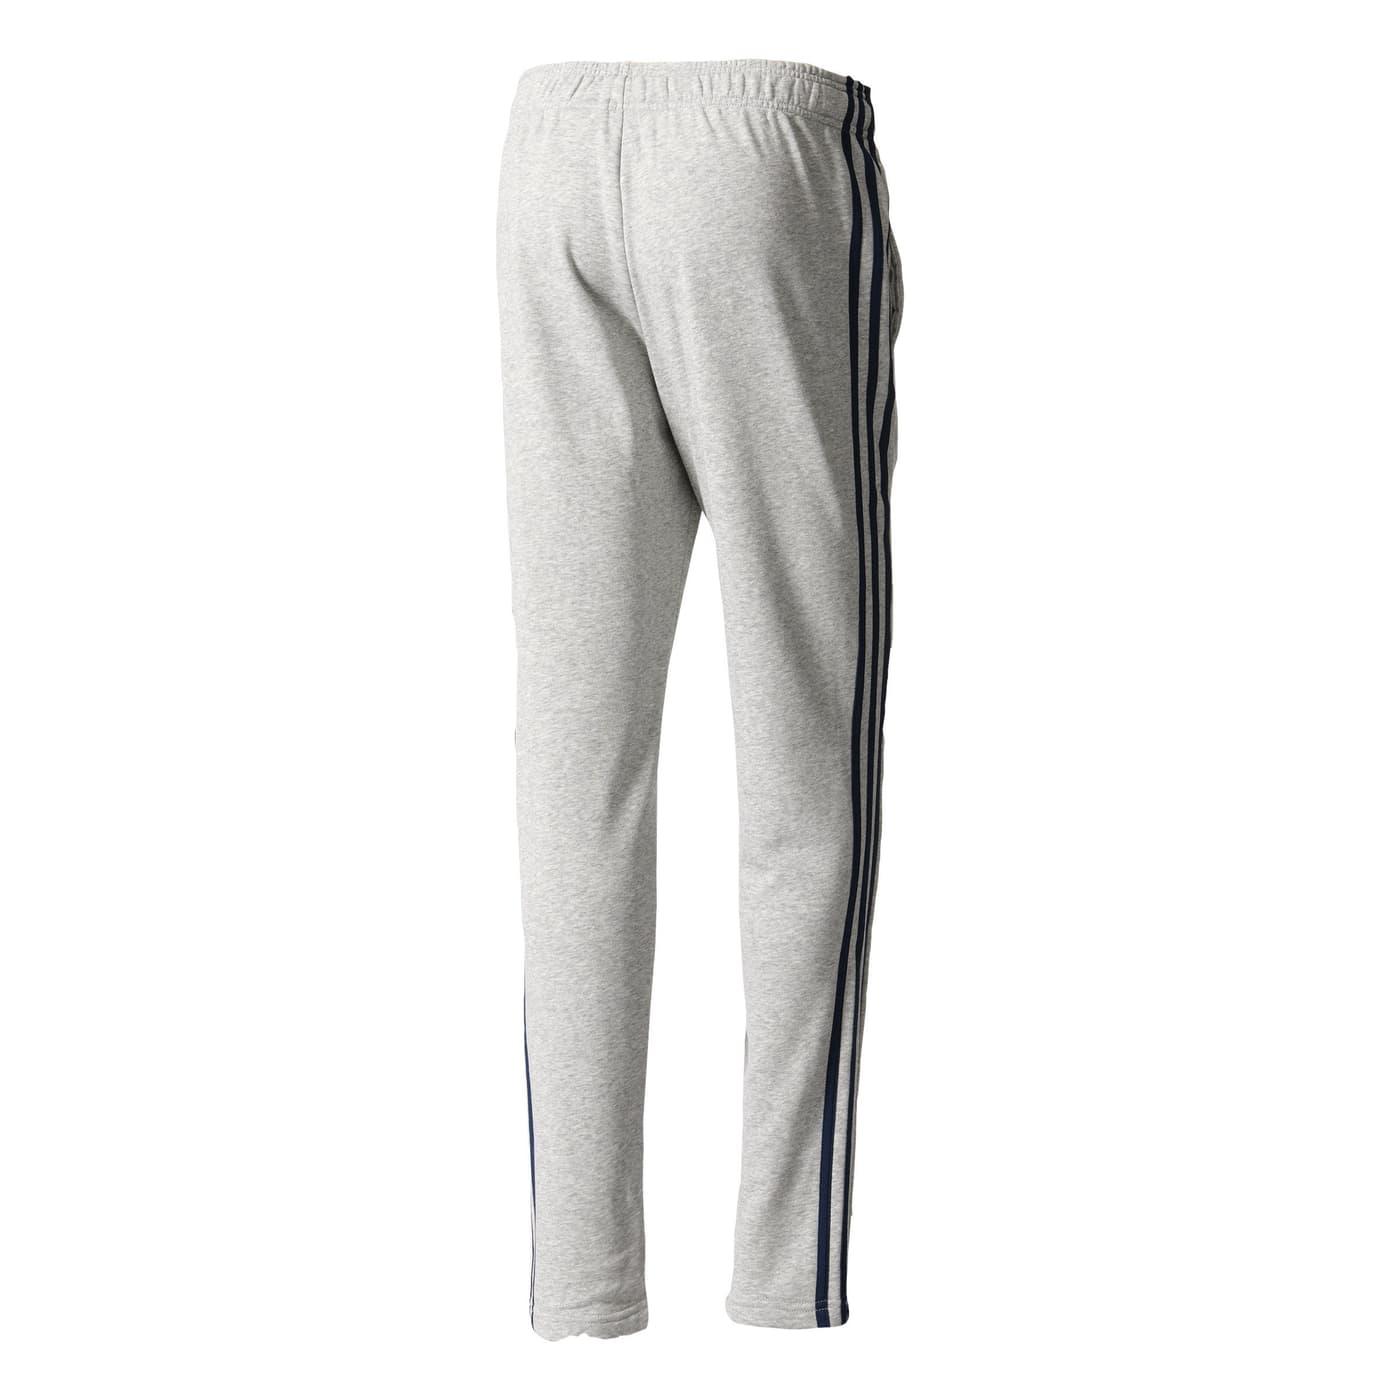 pantaloni adidas essentials uomo